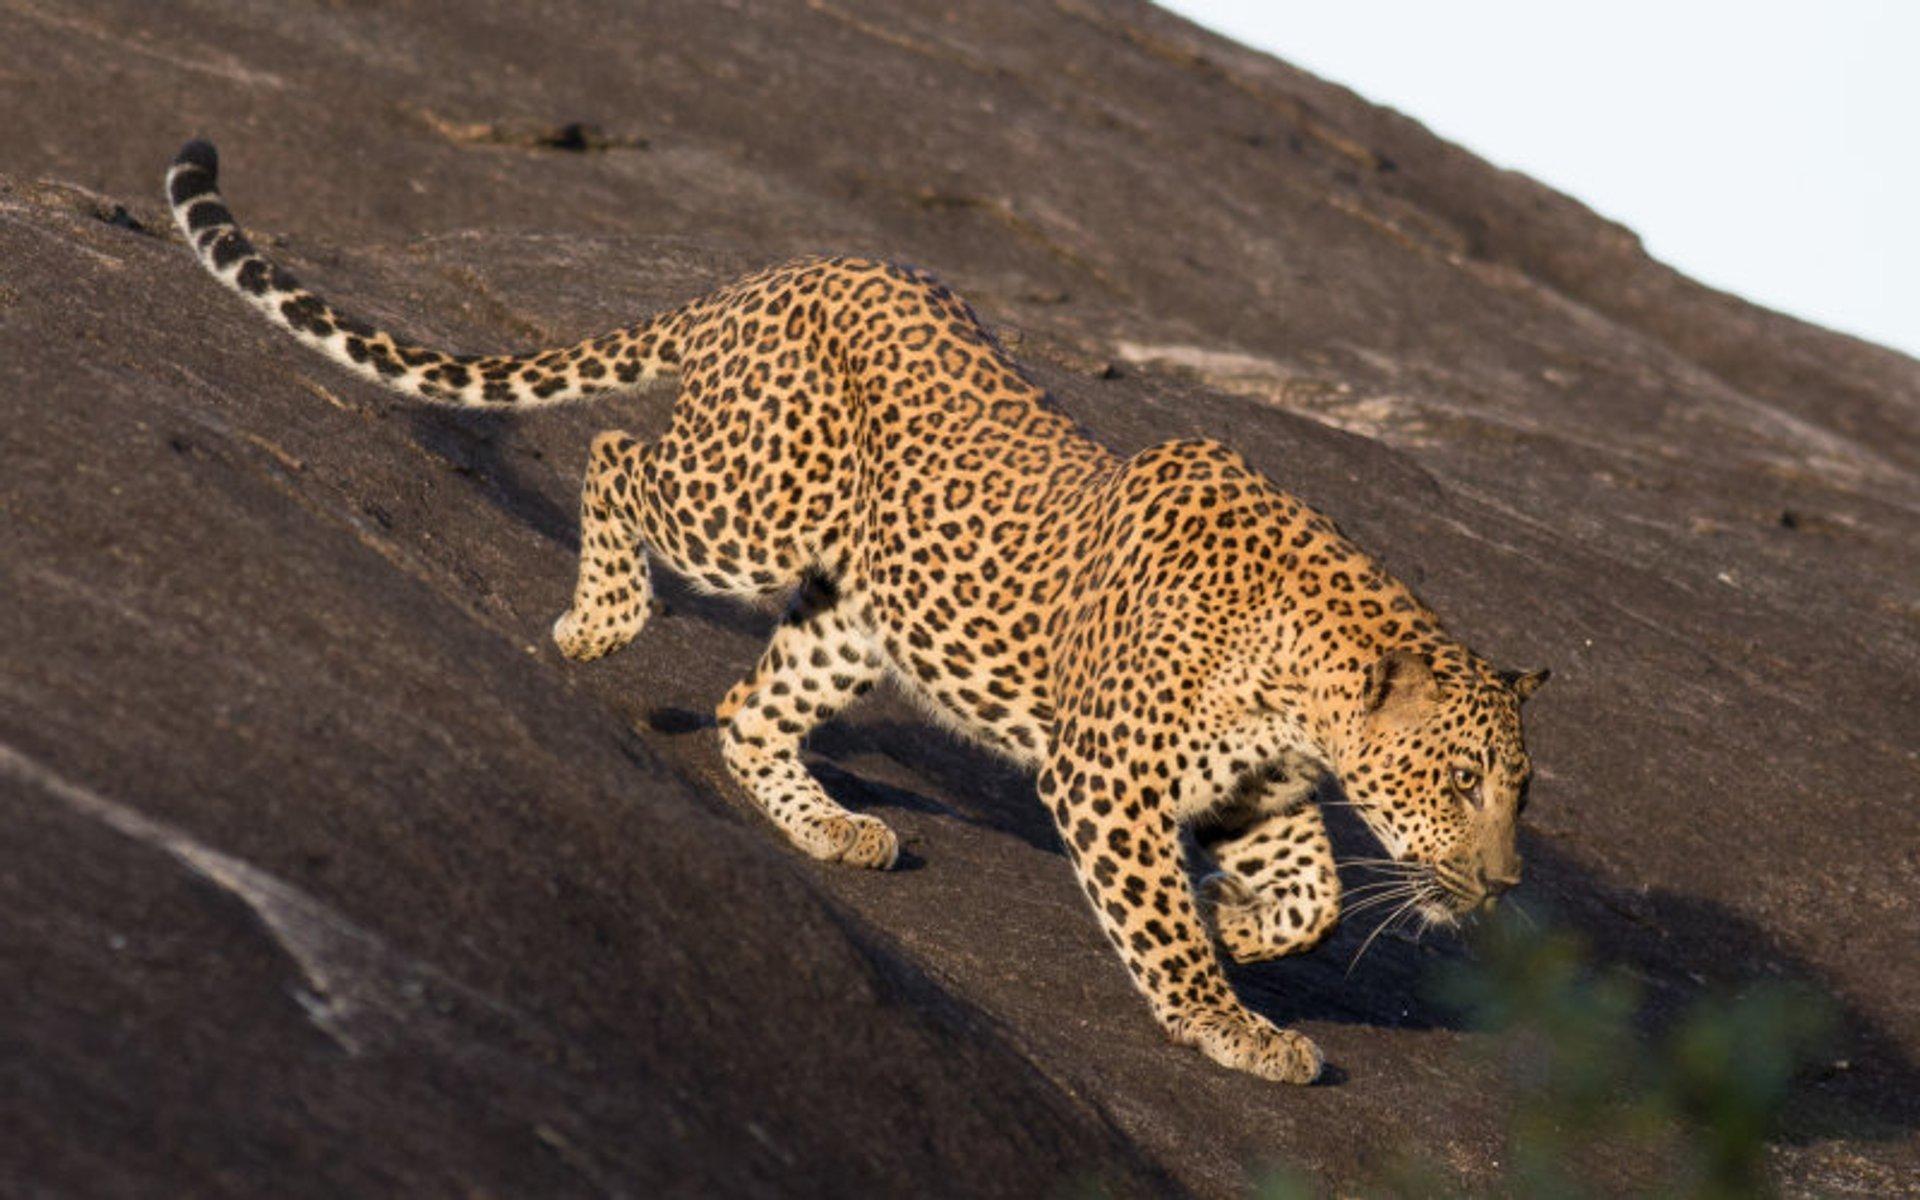 Leopard Safari in Sri Lanka 2020 - Best Time